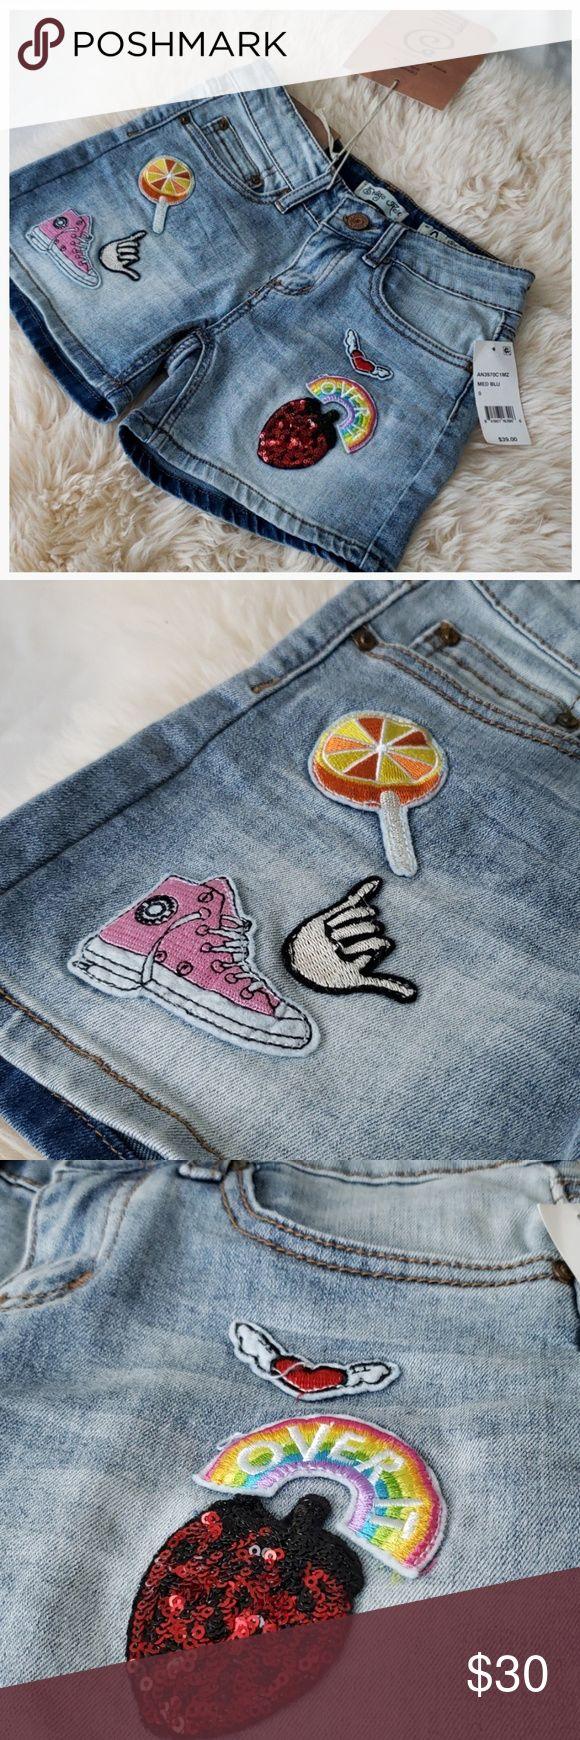 Aufnäher rainbow blue jean shorts Indigo Rein | NWT Super süße Patchwork Jeans …   – Woven Webb Boutique